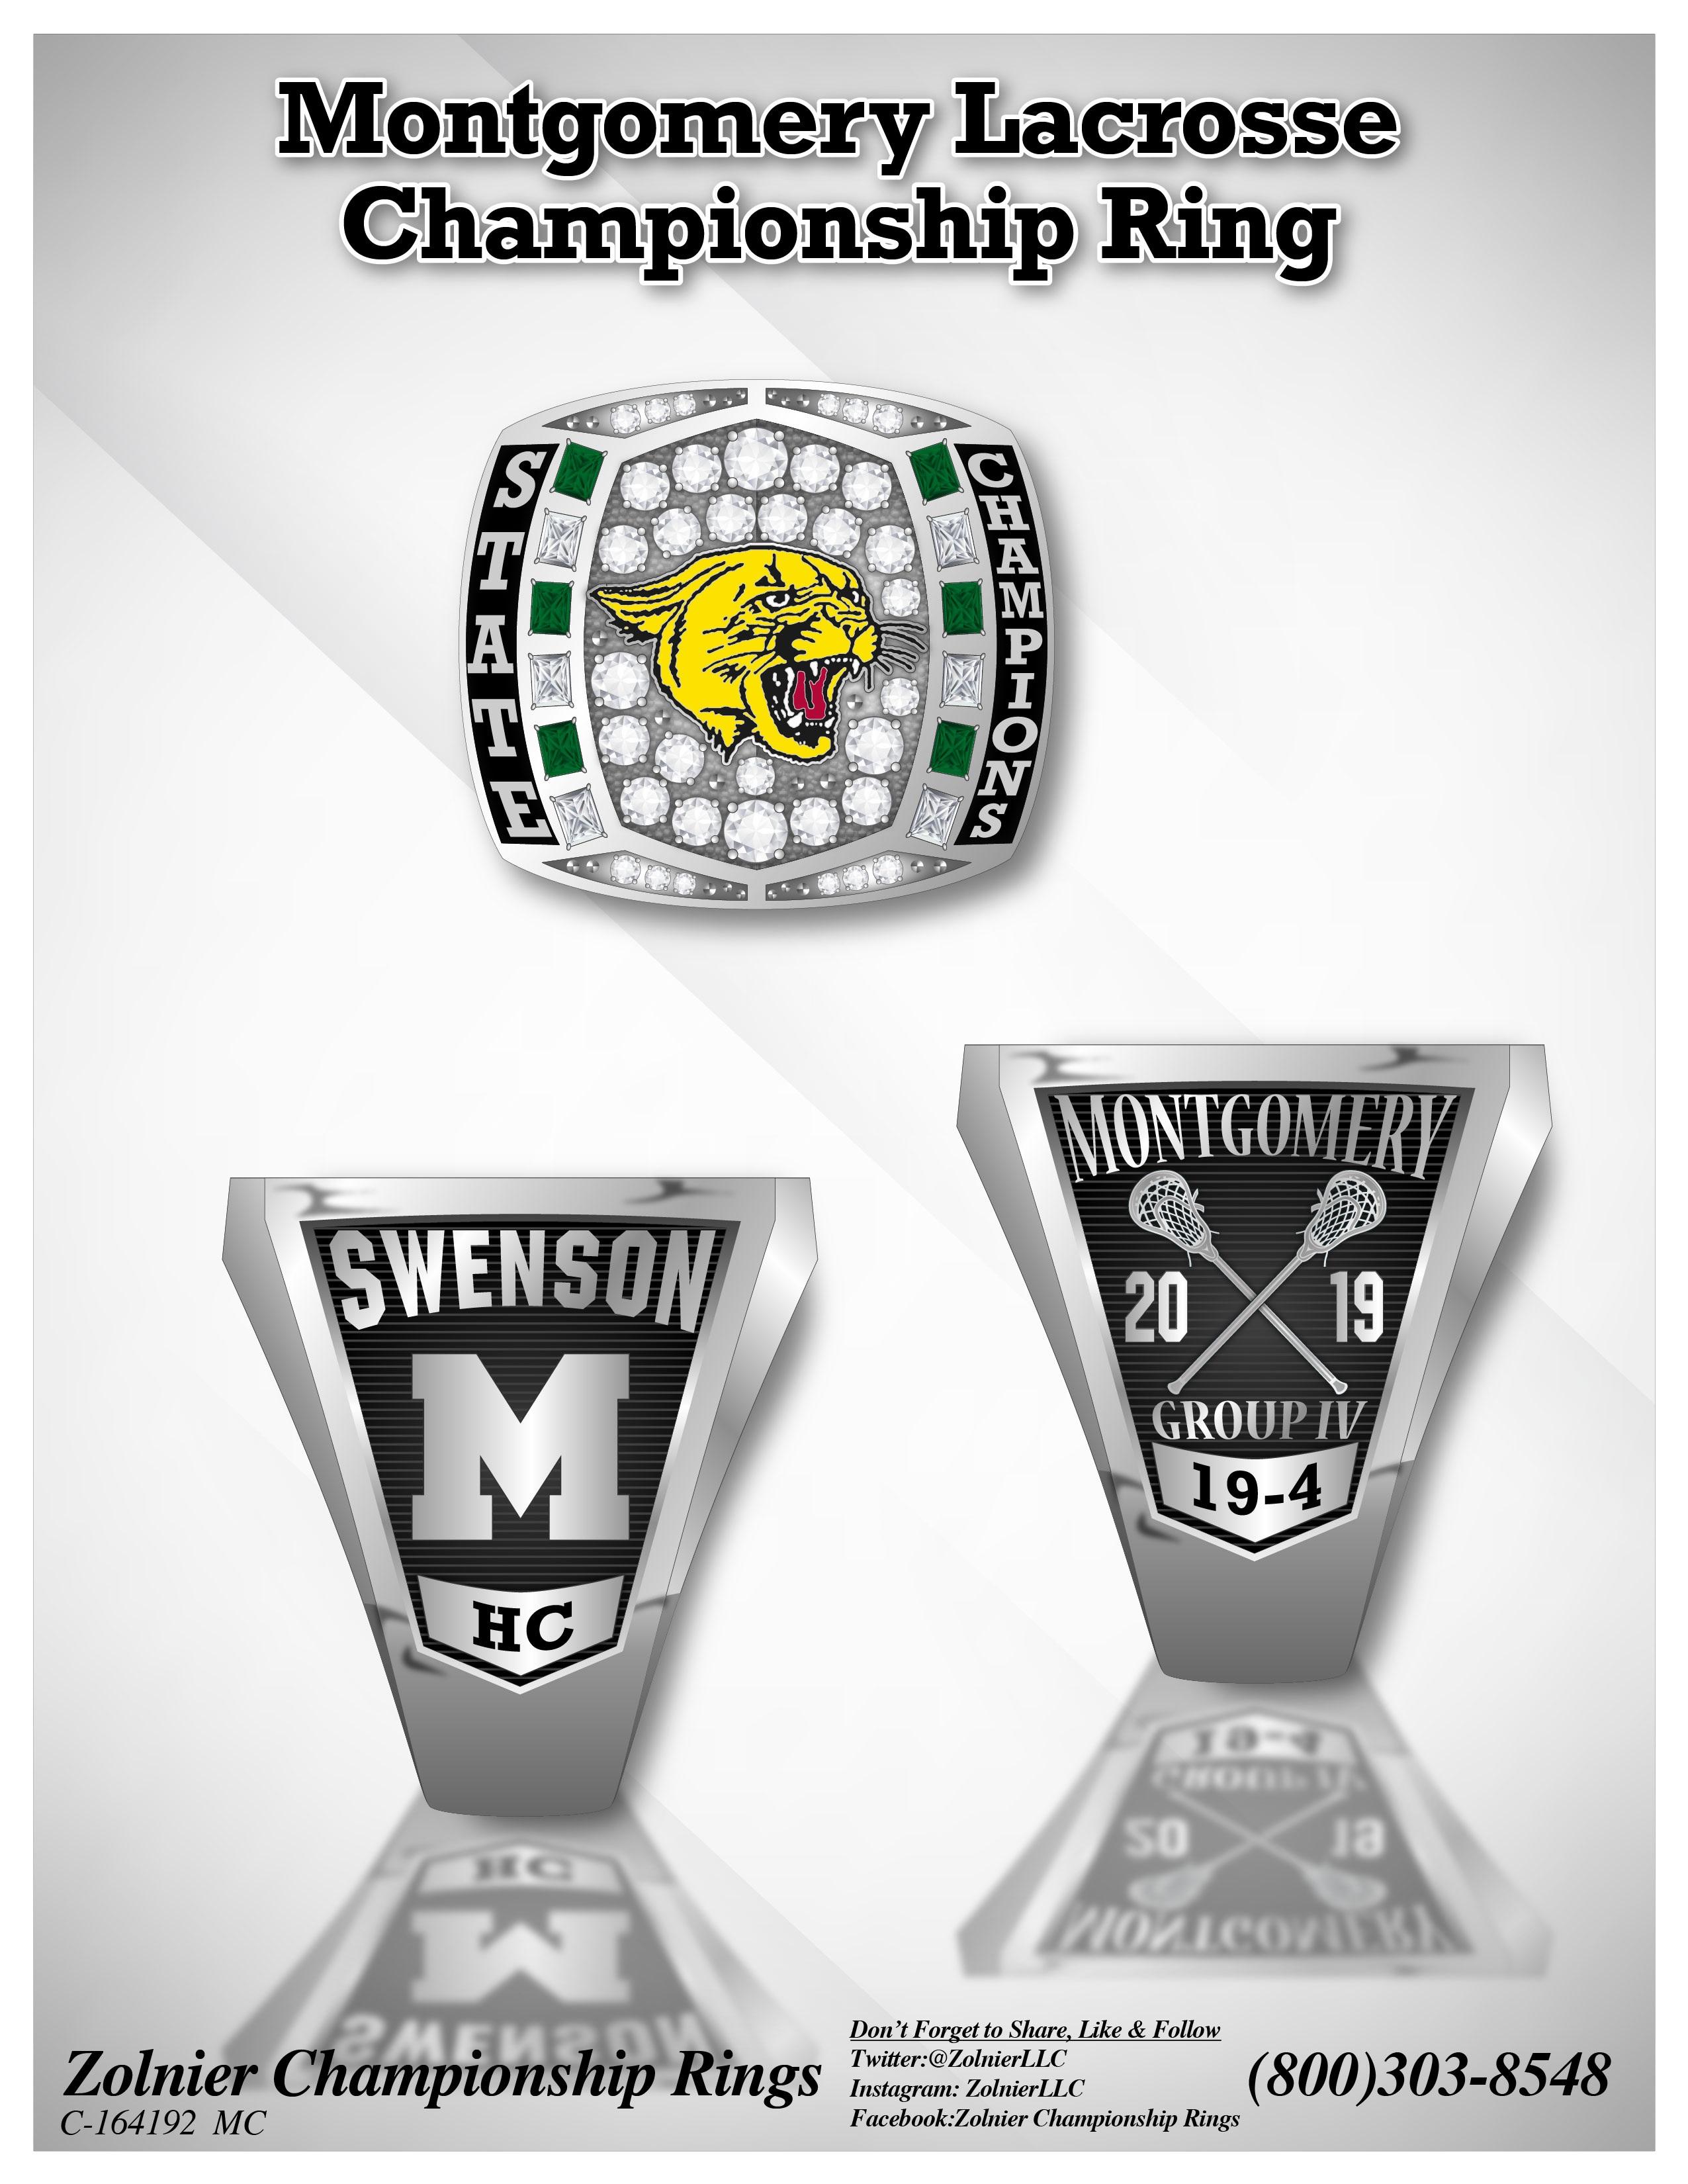 C-164192 Montgomery Lacrosse Champ Ring